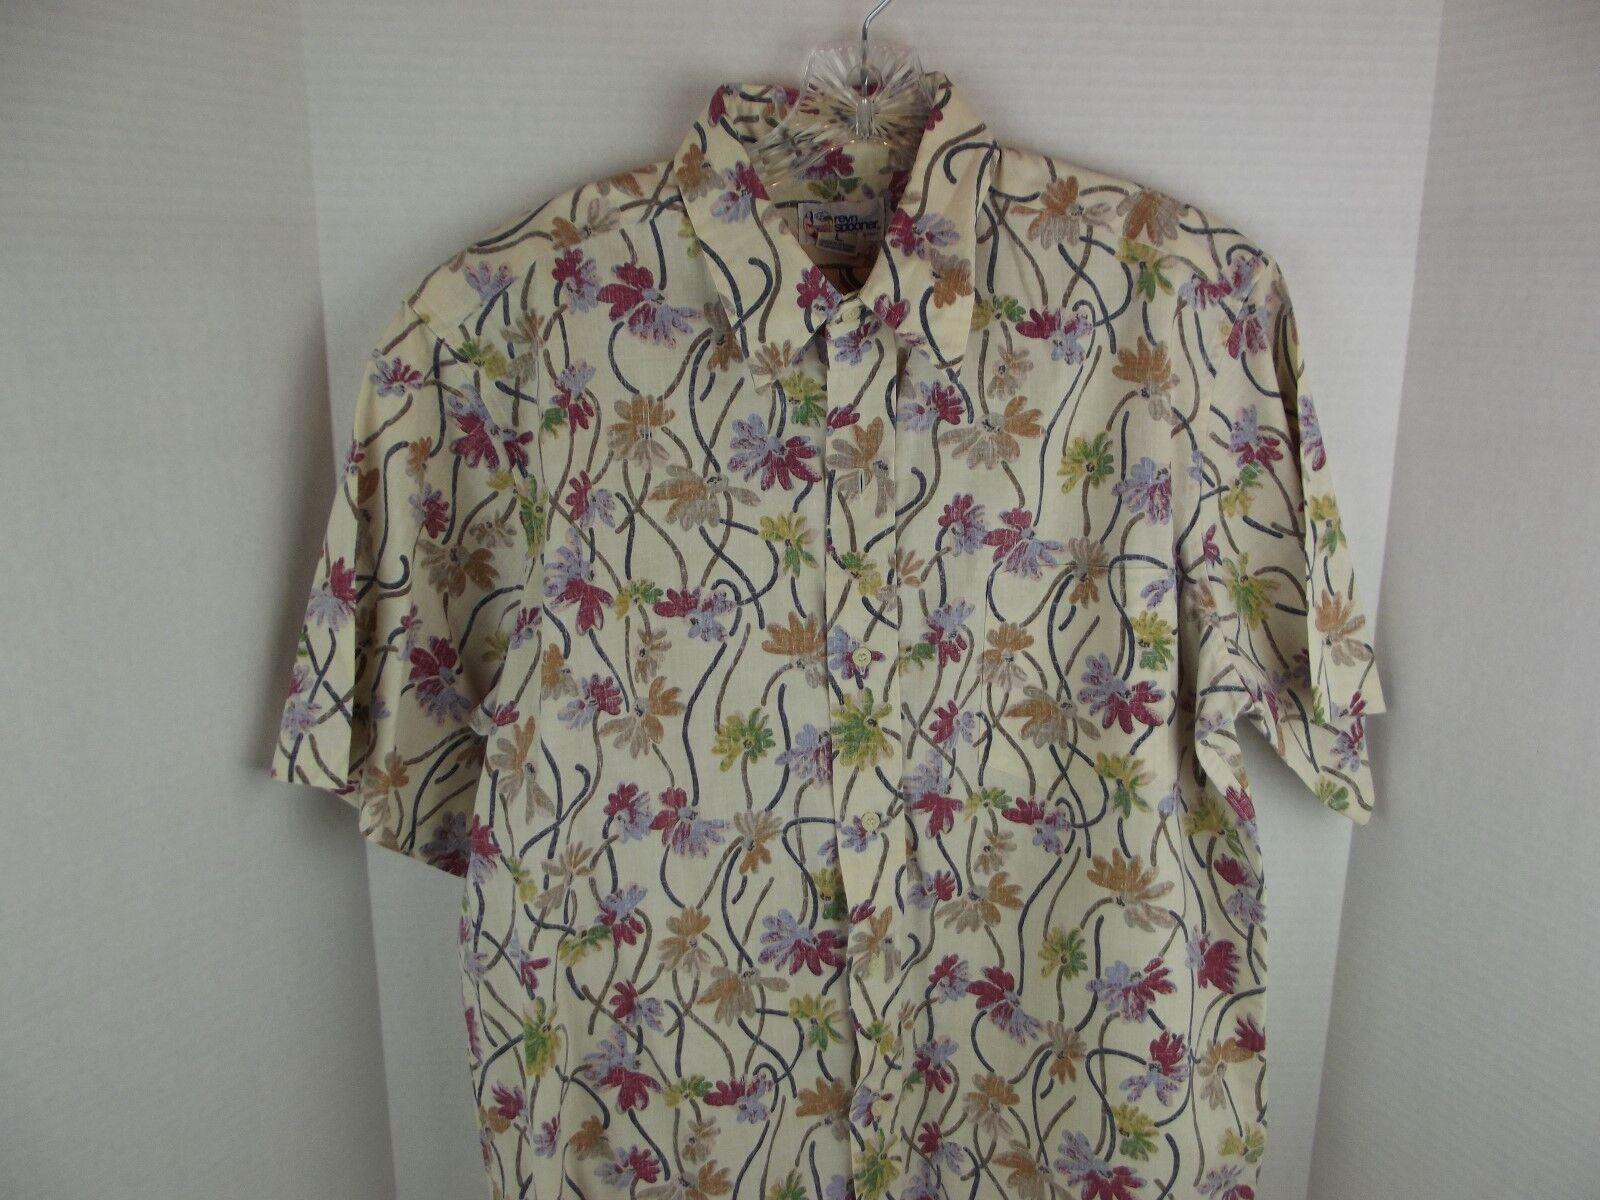 Reyn Spooner VTG Reverse Print Floral Hawaiian Camp Shirt Men's Sz. Large